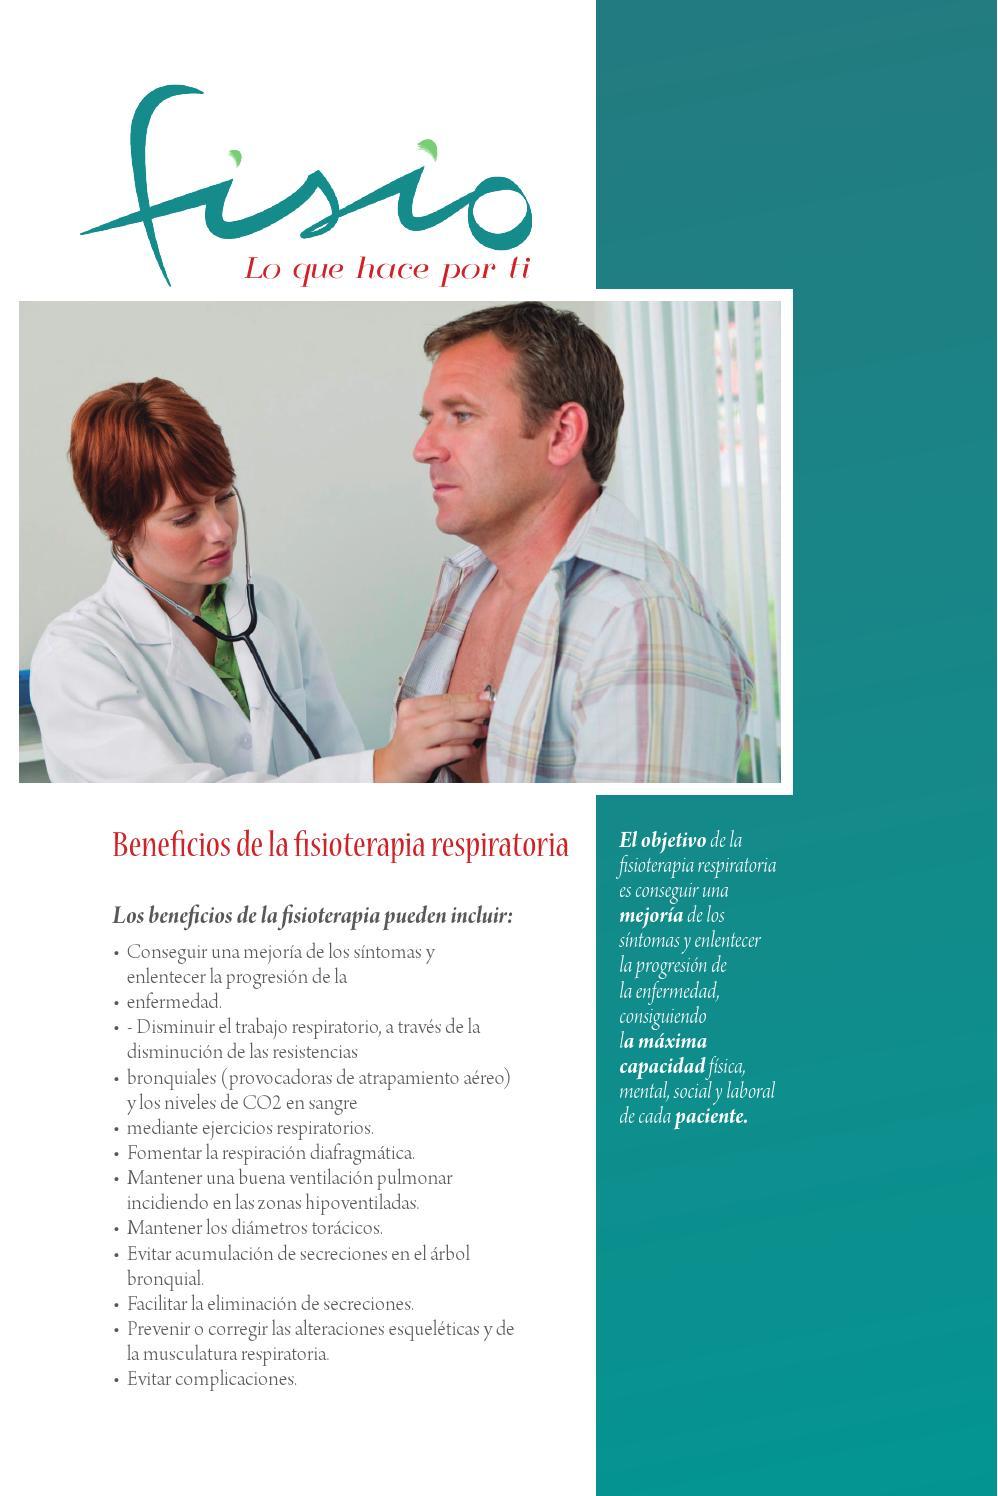 FISIOTERAPIA RESPIRATORIA by MDESIGN - issuu